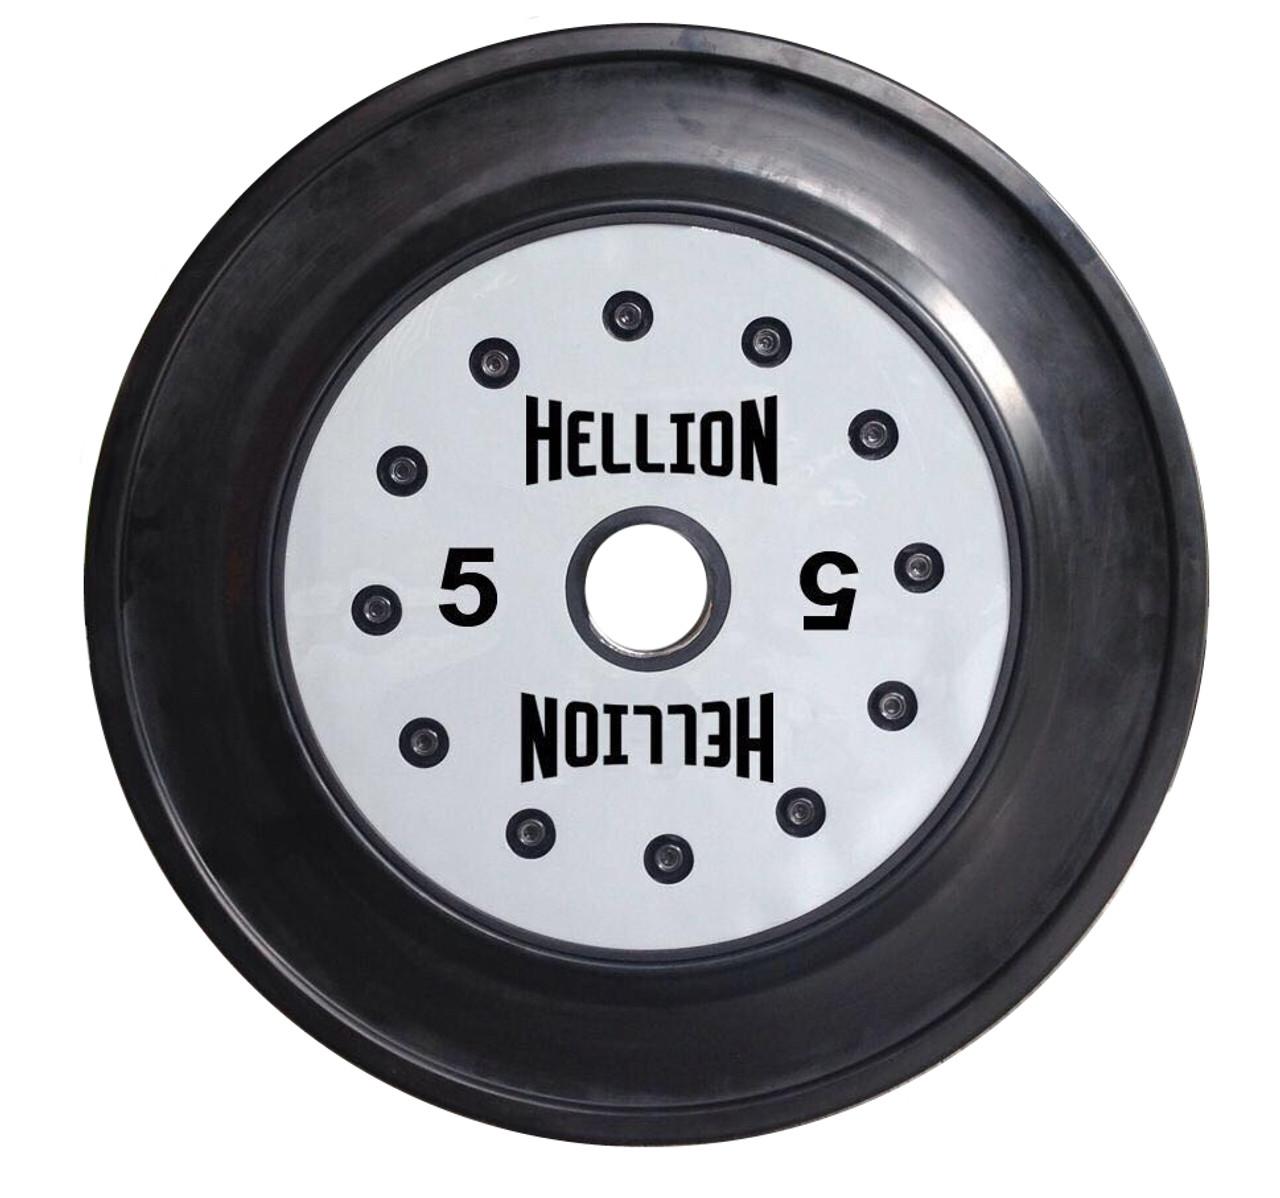 Hellion Premium Training 5 kg Bumper Plate (PAIR)